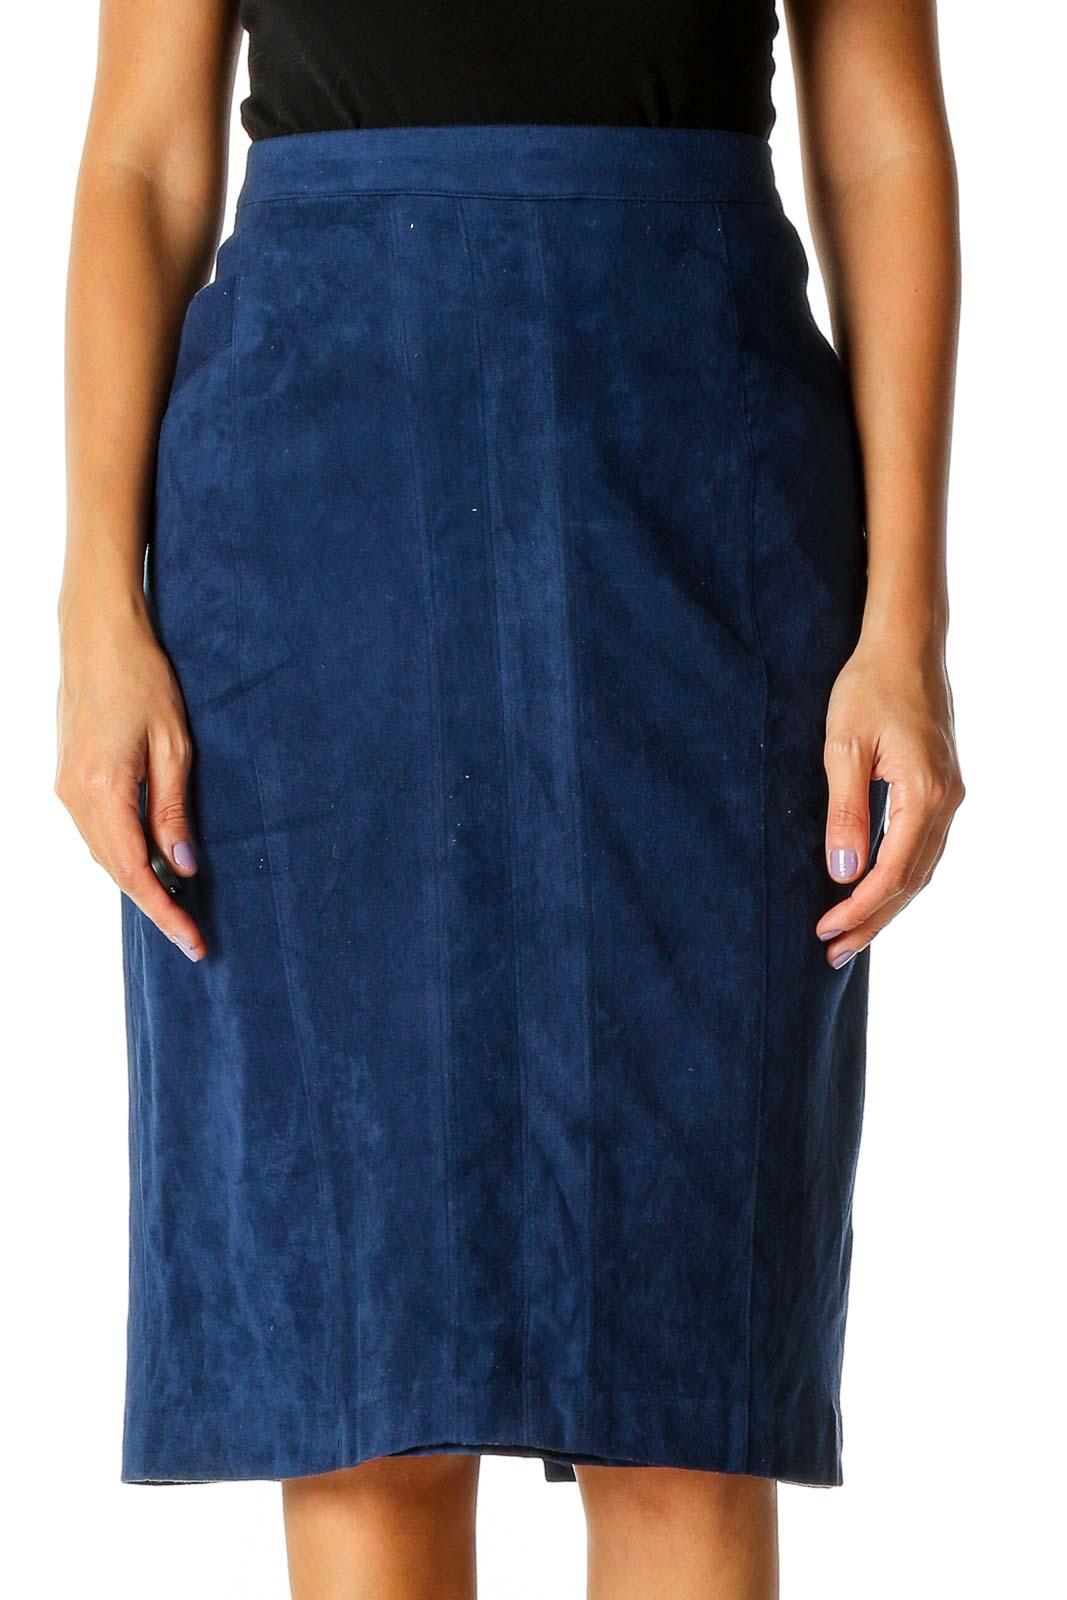 Blue Retro A-Line Skirt Front